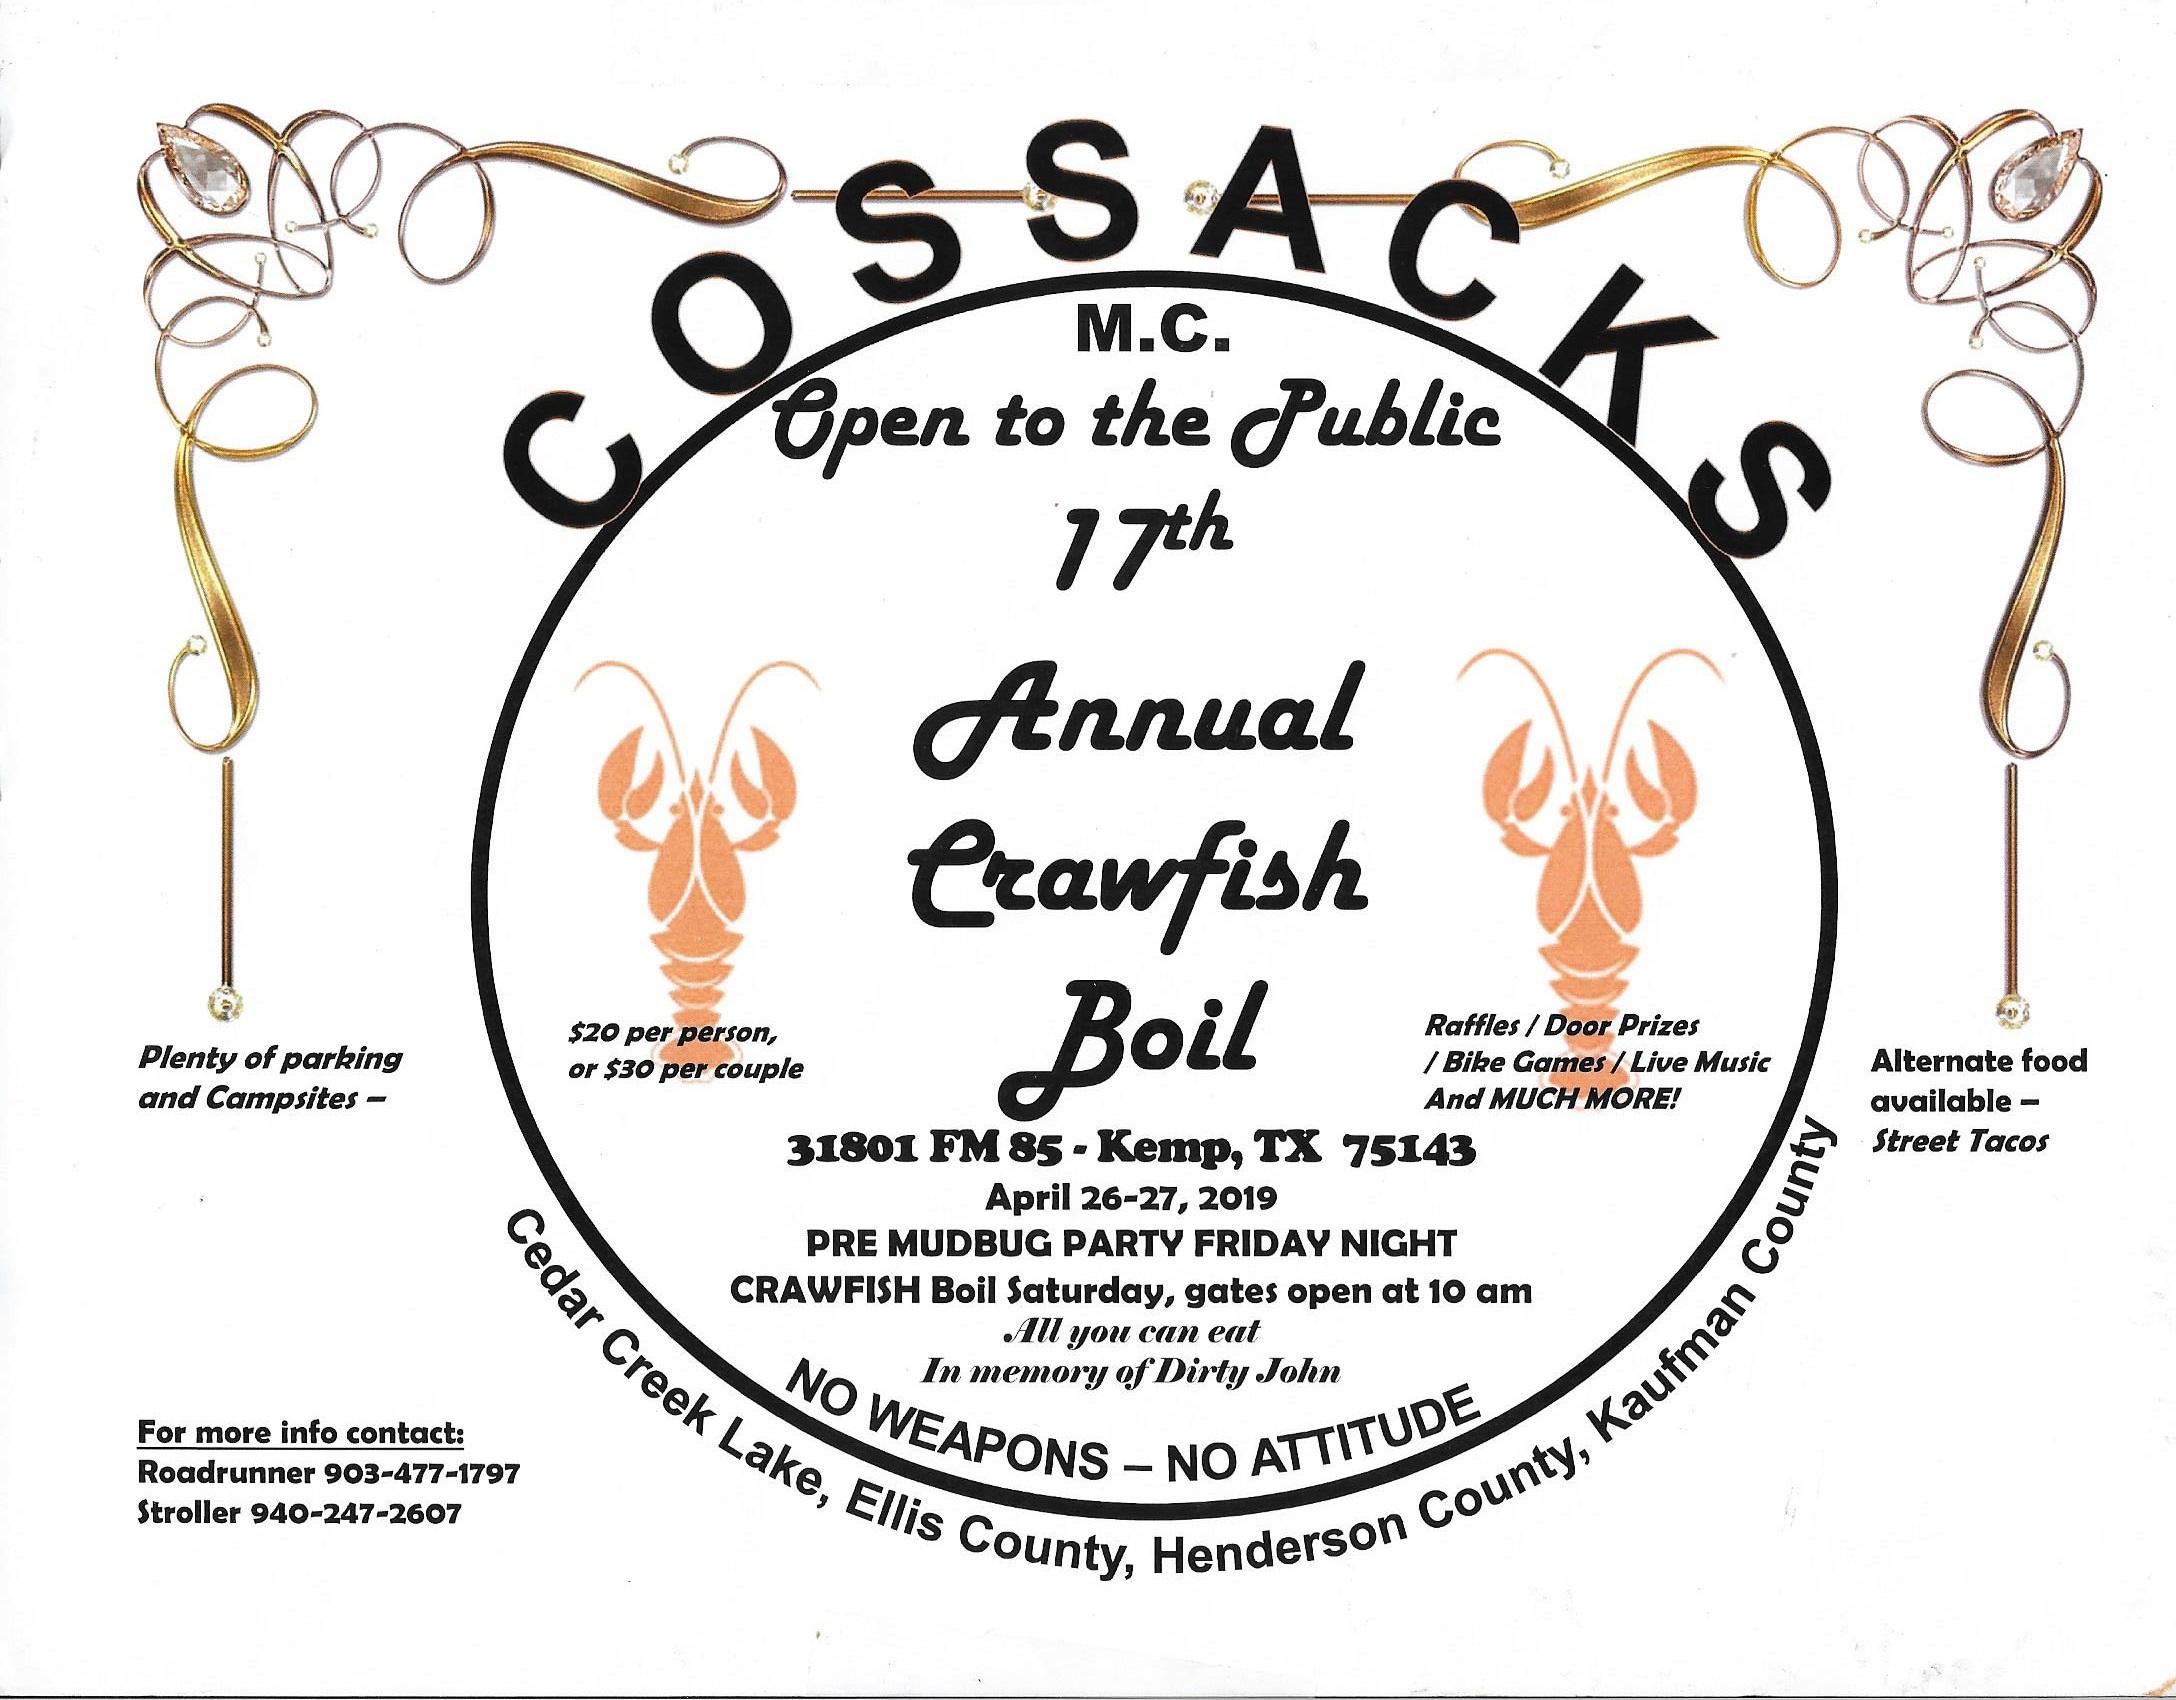 Cossacks17th April 26th-27th.jpg